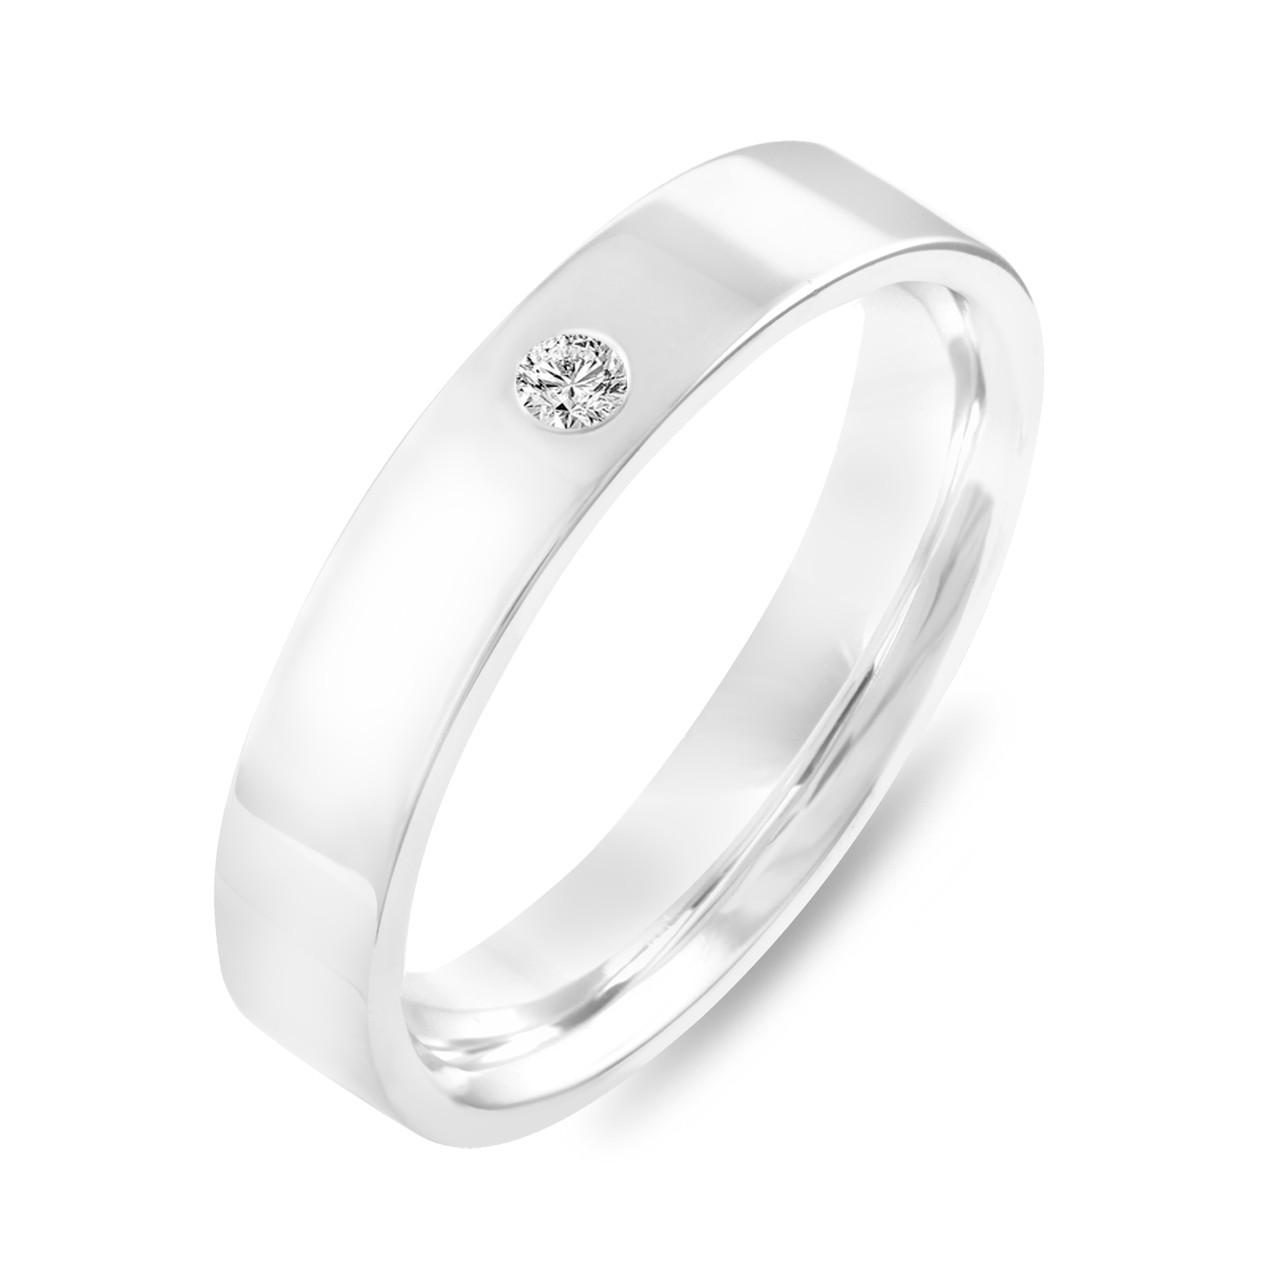 Wedding Band Men.Diamond Wedding Band Diamond Wedding Ring Womens Wedding Band Mens Flat Wedding Band 4 Mm Anniversary Ring 14k White Gold Handmade